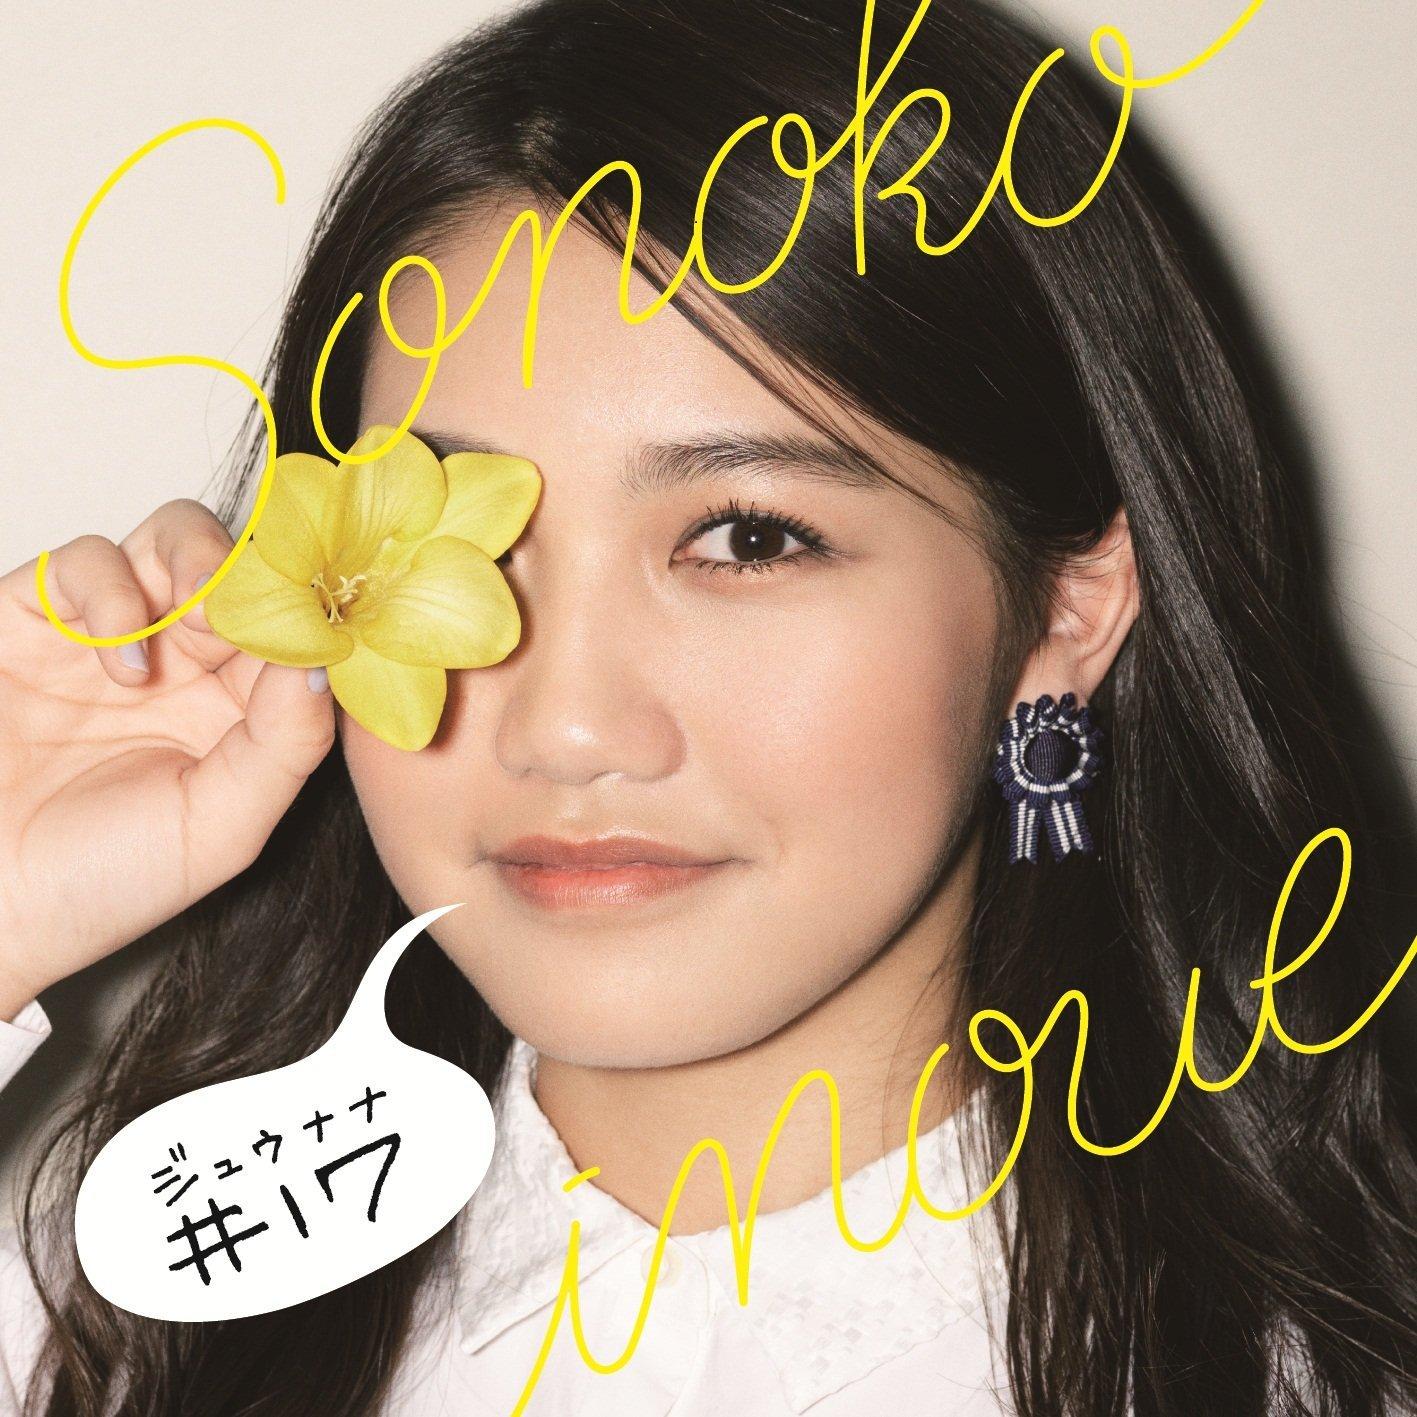 20180627.1428.21 Sonoko Inoue - #17 (FLAC) cover.jpg